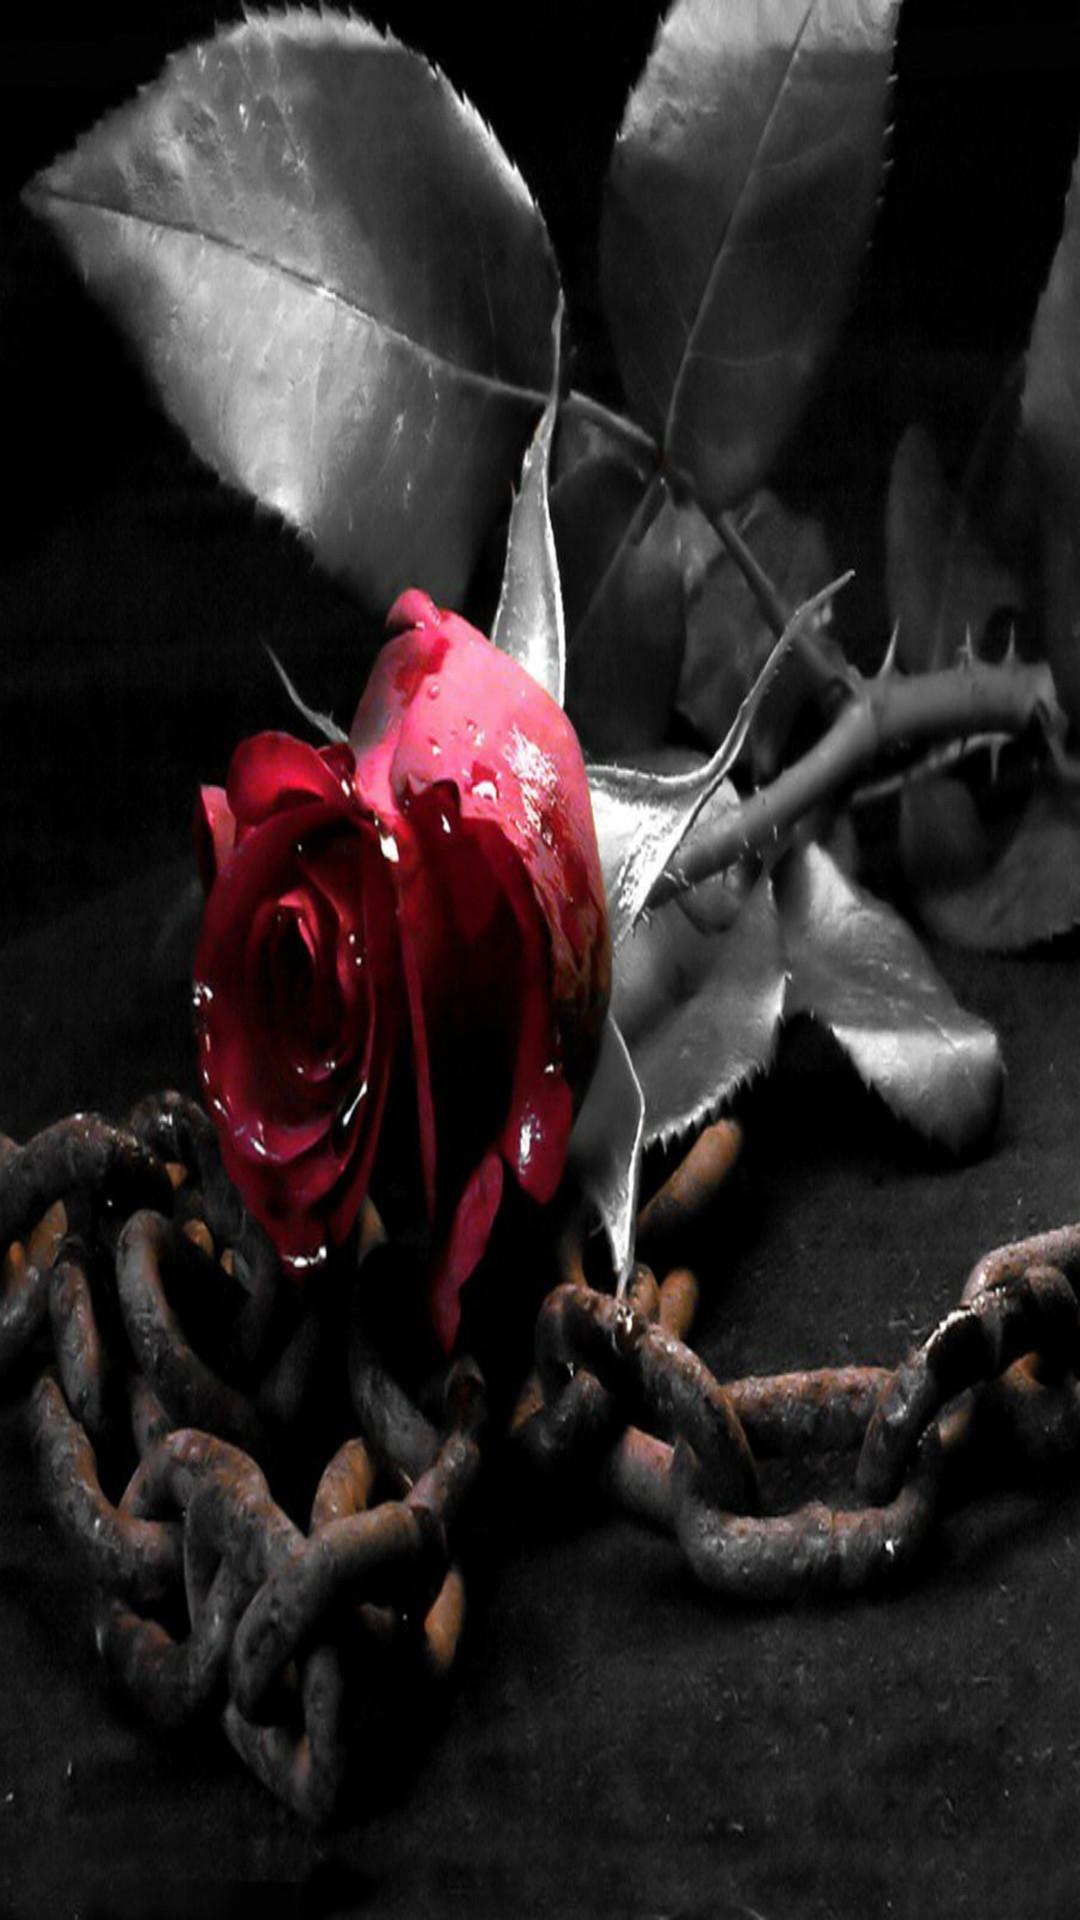 Black roses background wallpapertag - Black and red rose wallpaper ...